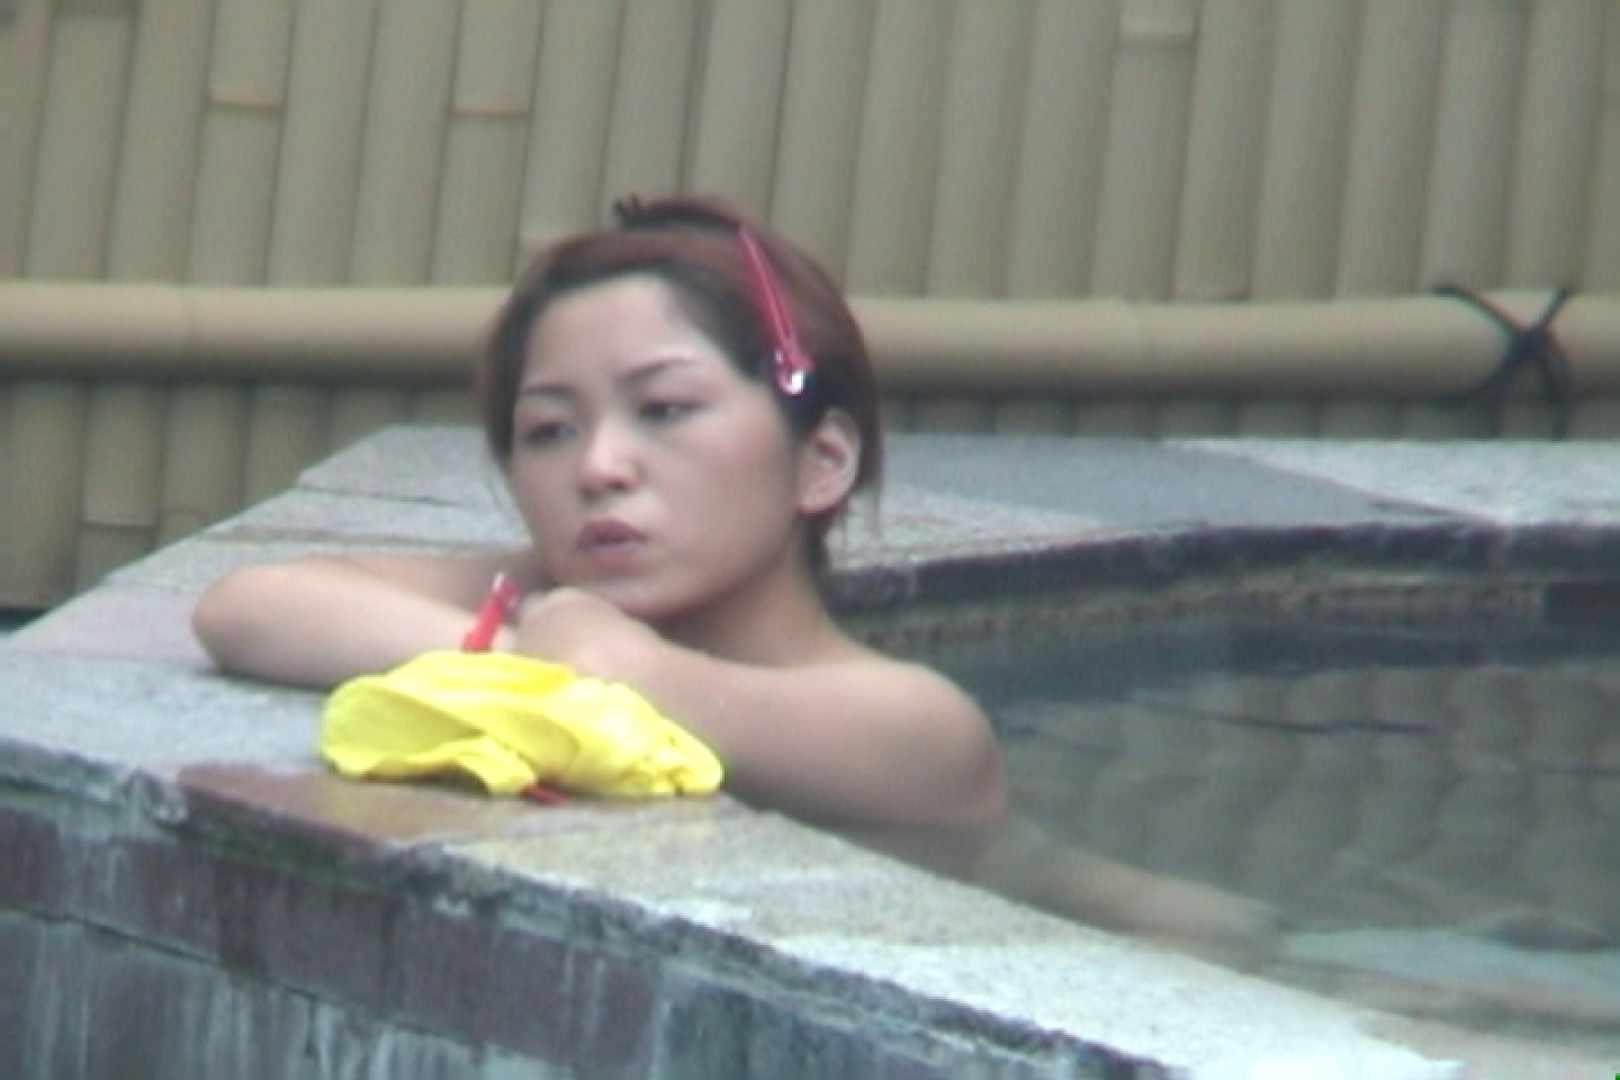 Aquaな露天風呂Vol.574 0 | 0  81連発 23